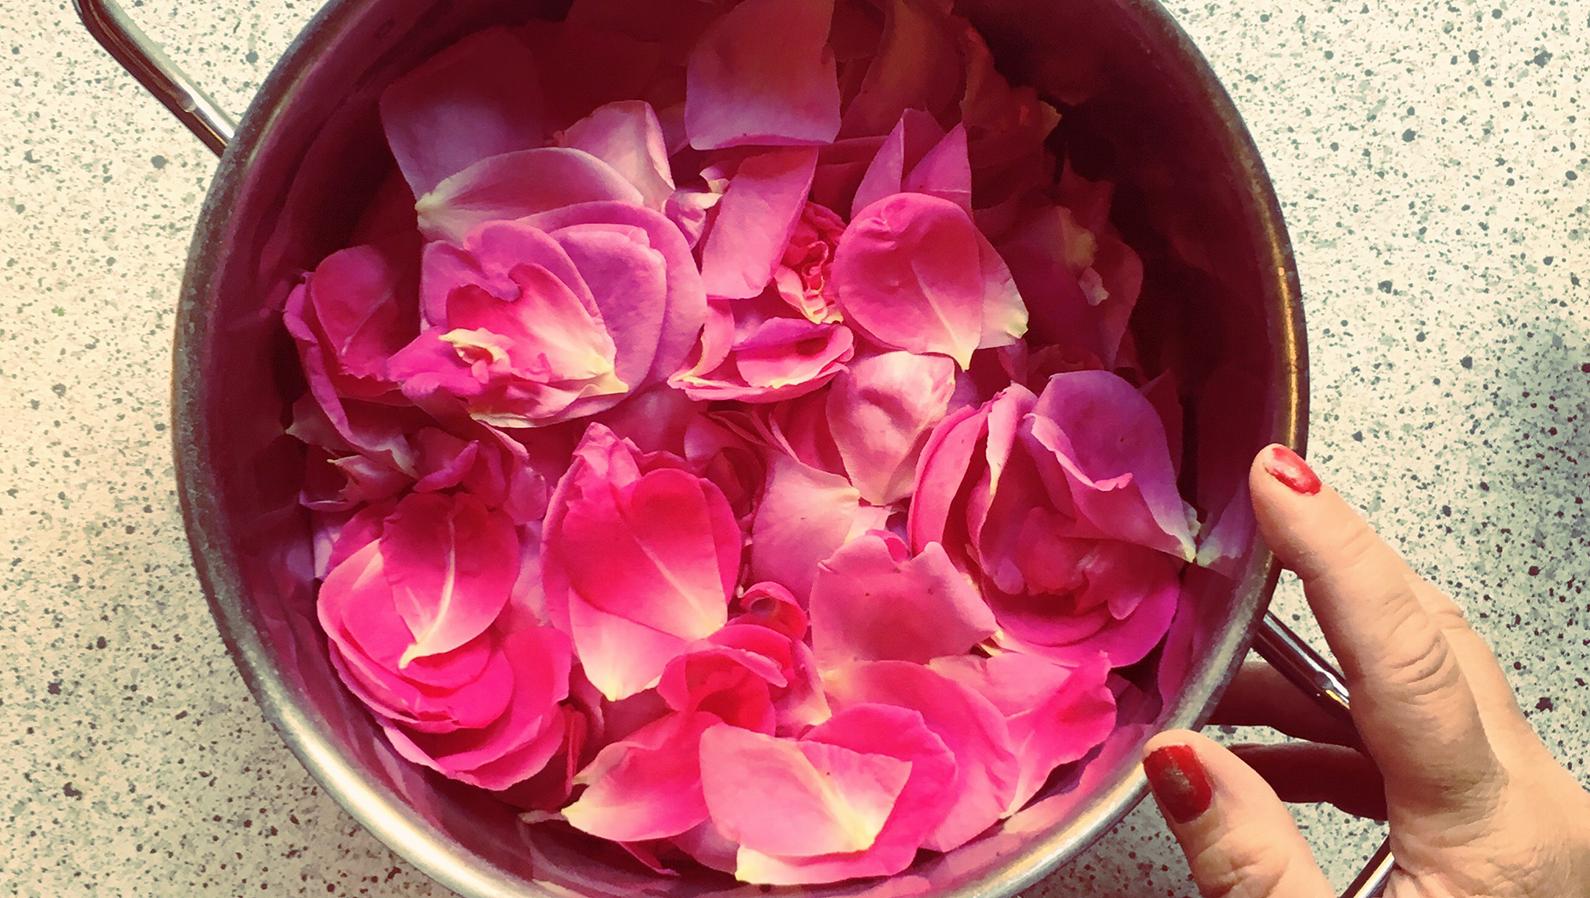 rosenblade_stinamy